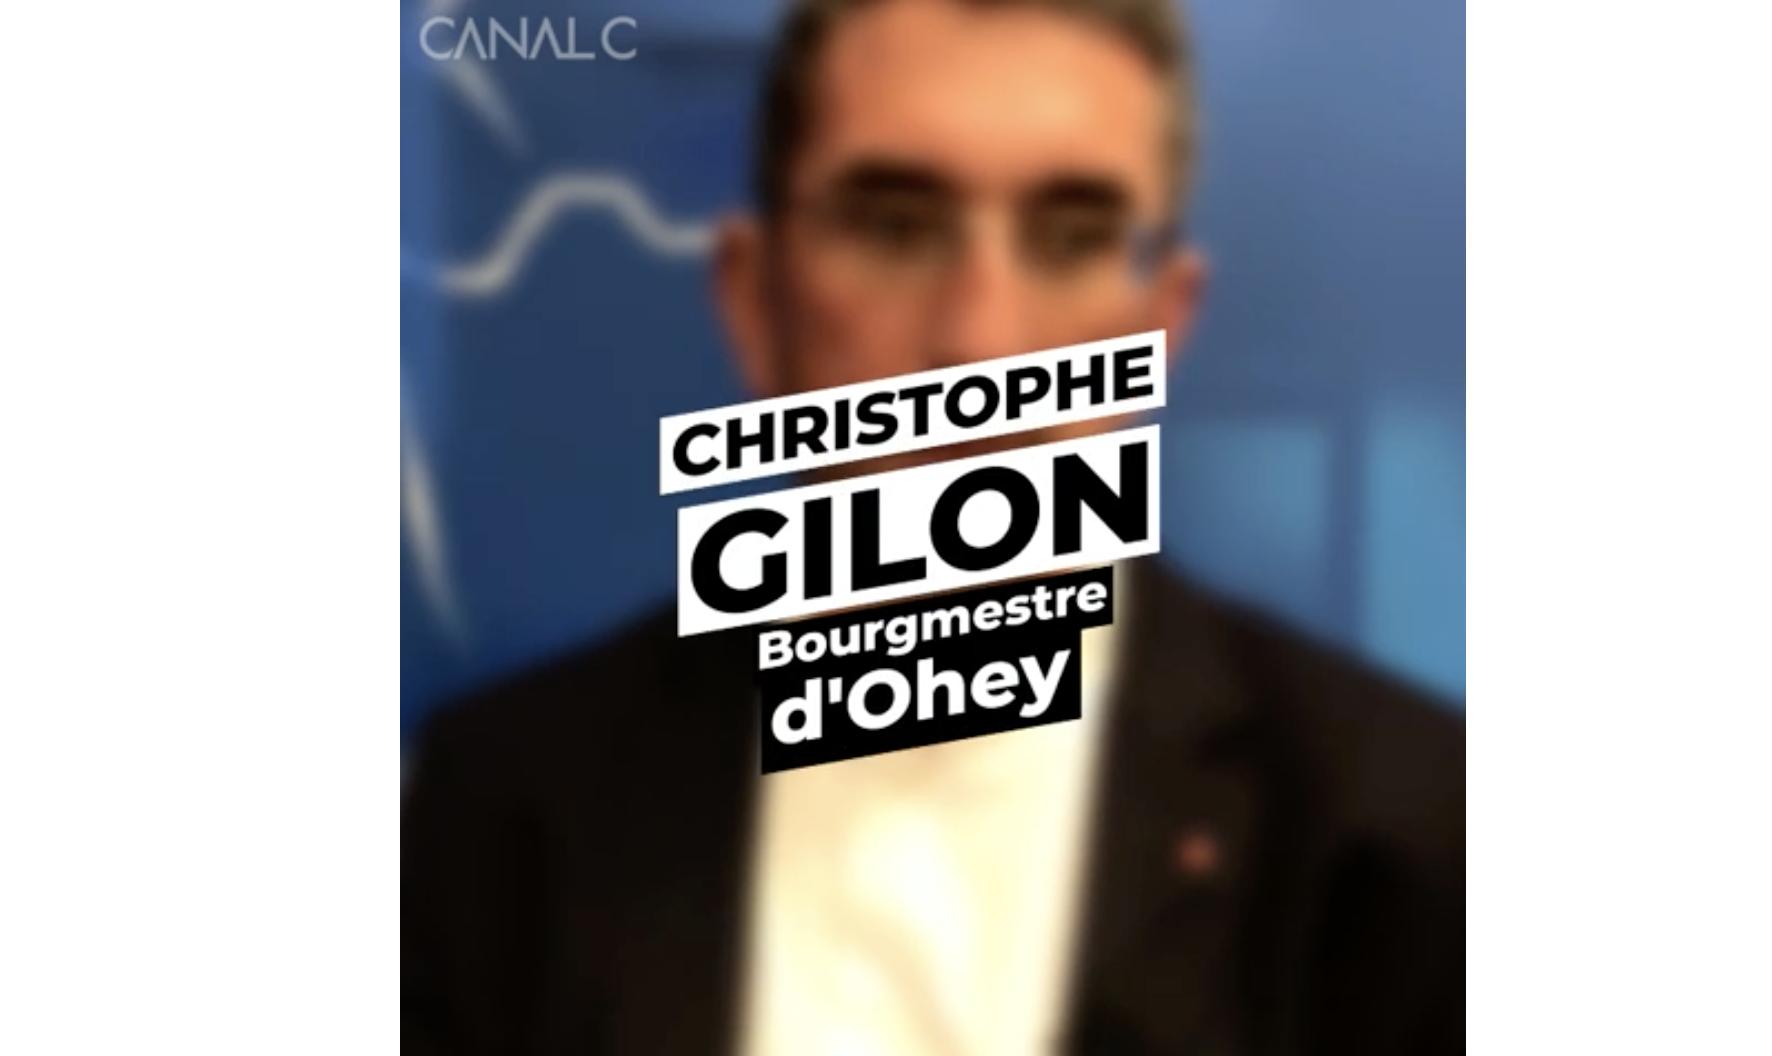 Christophe Gilon - Bourgmestre d'Ohey